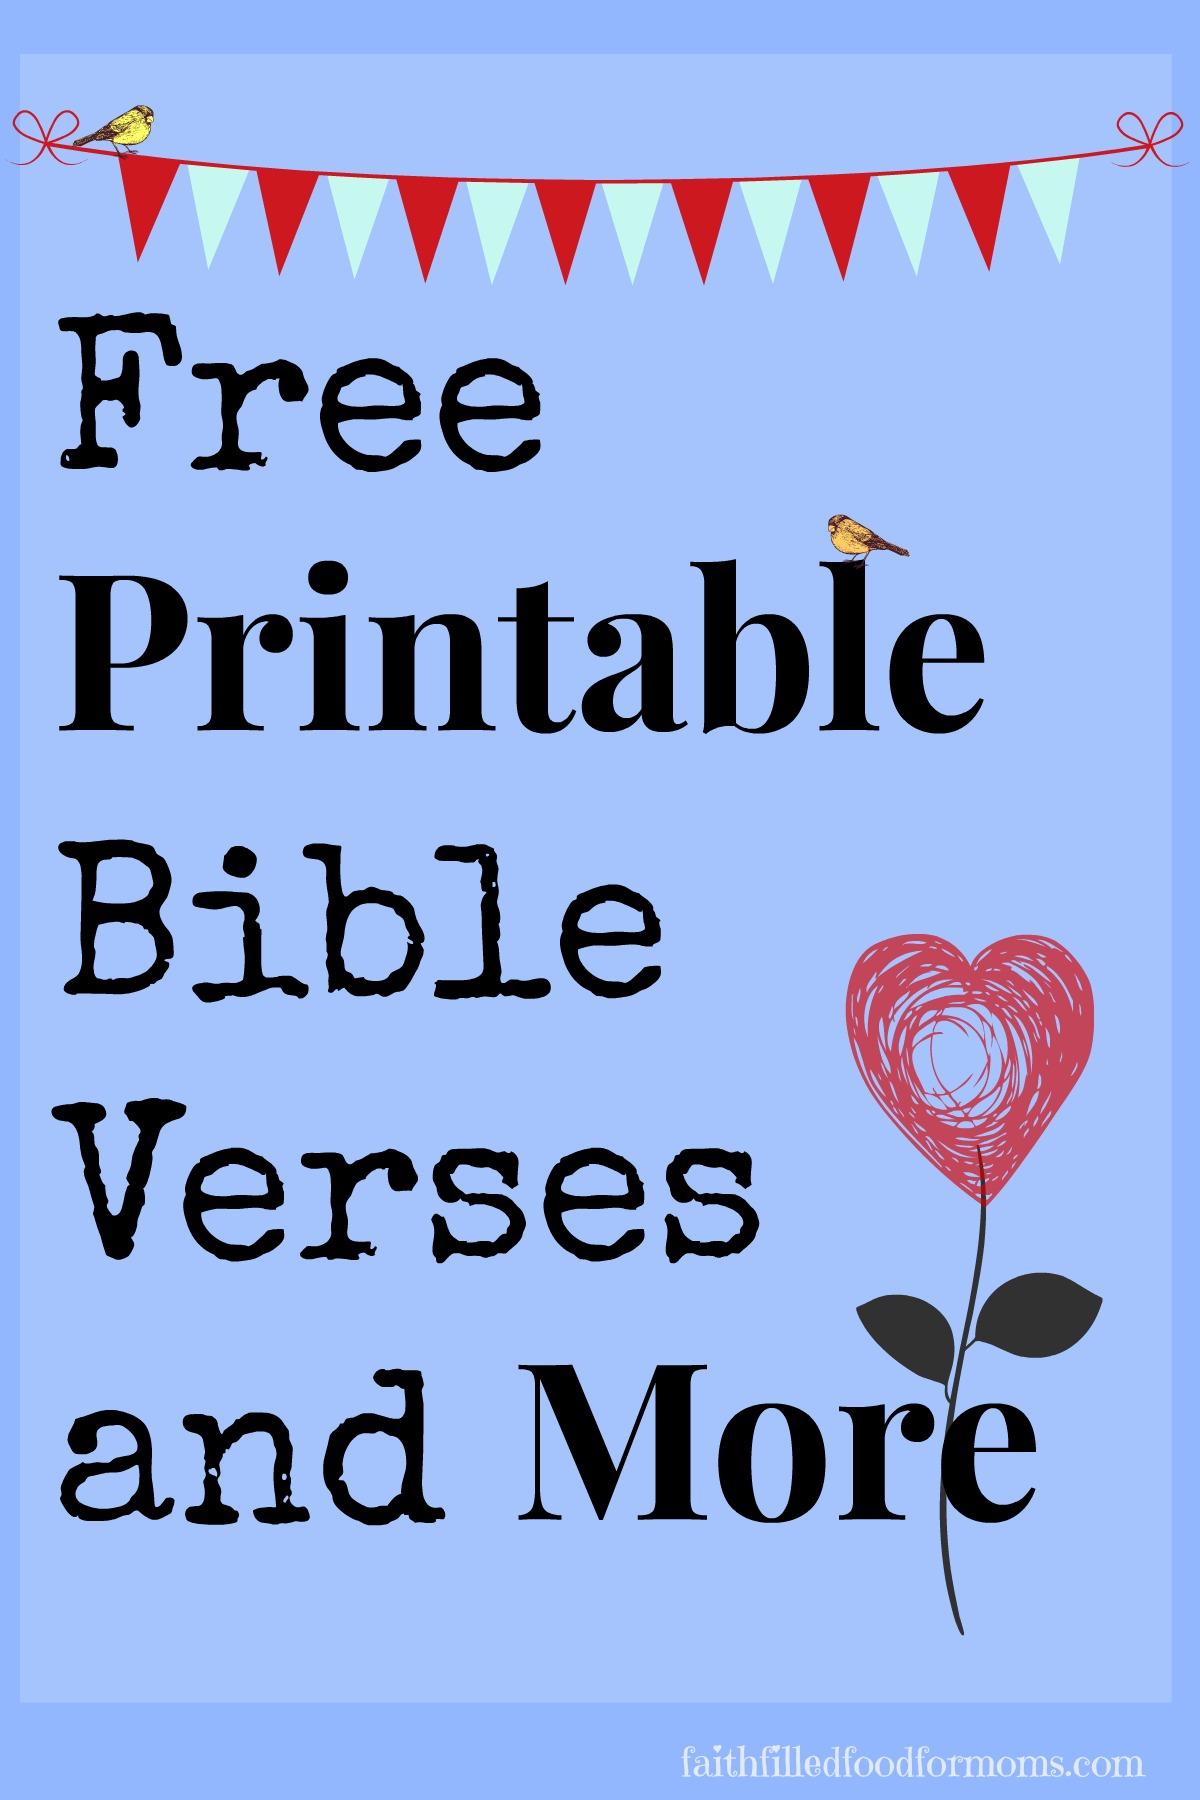 Free printable bible clipart jpg transparent Free printable bible clipart - ClipartFest jpg transparent